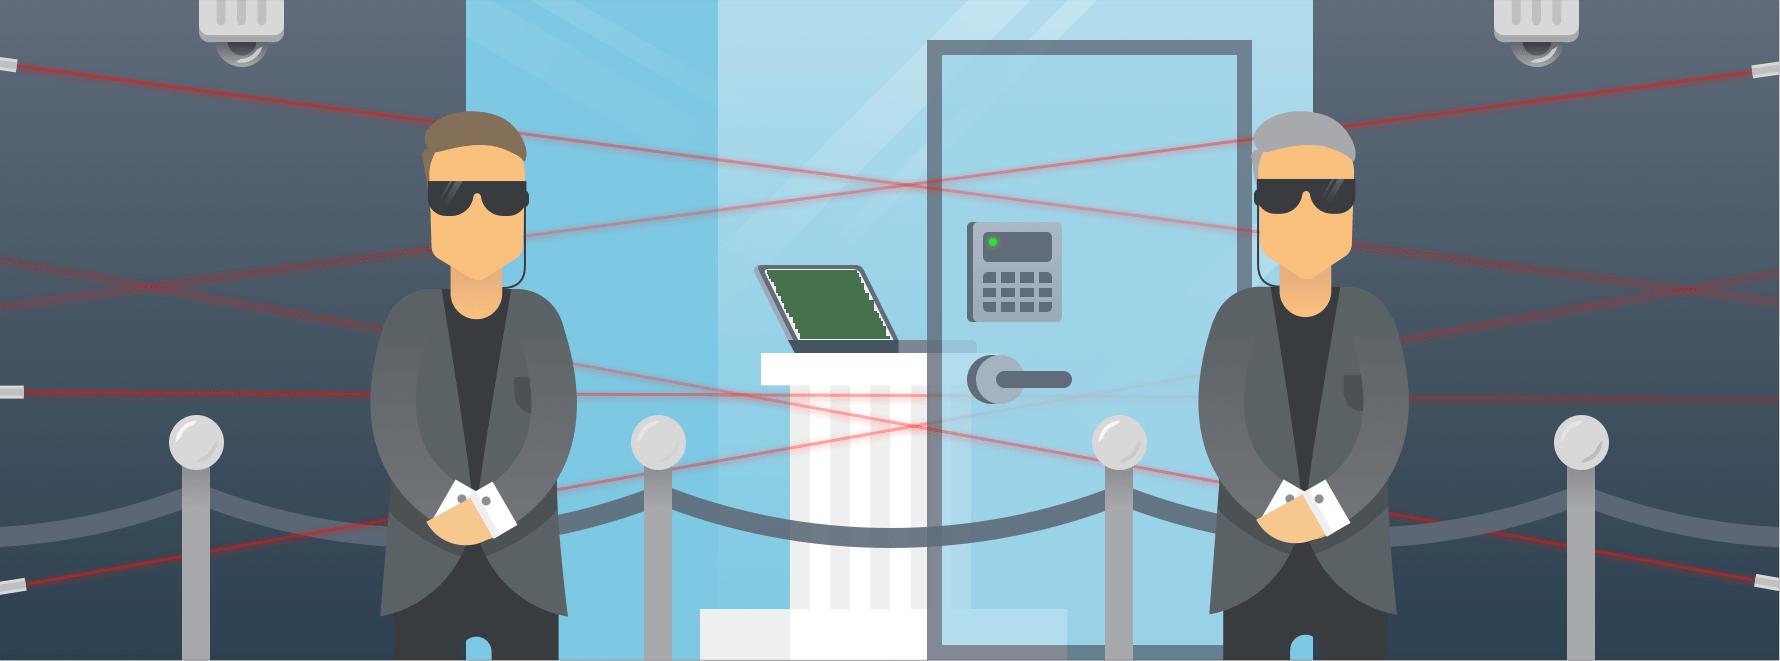 PCI compliant password scope